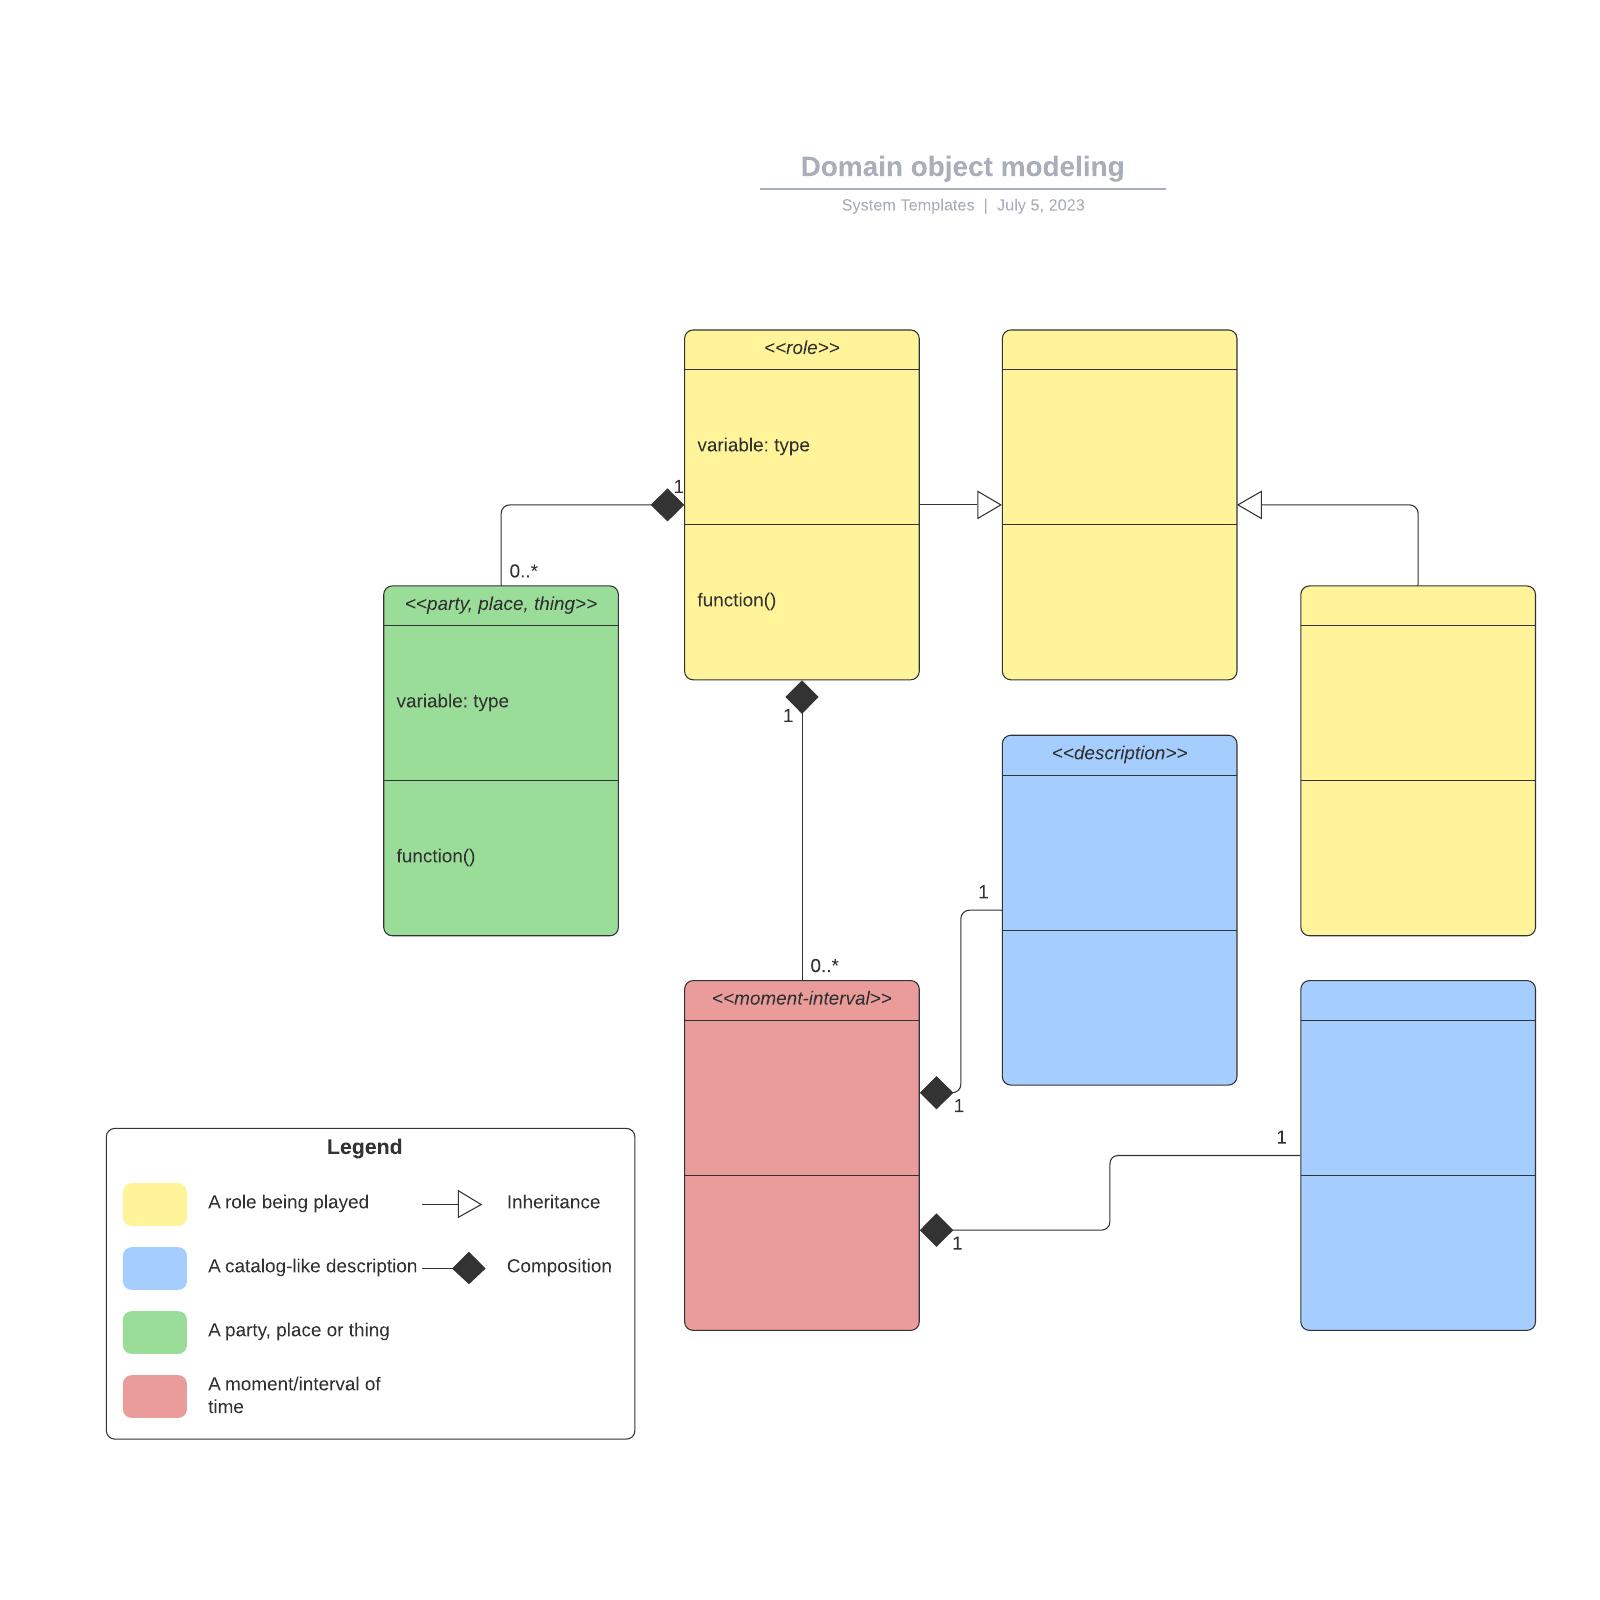 Domain object modeling